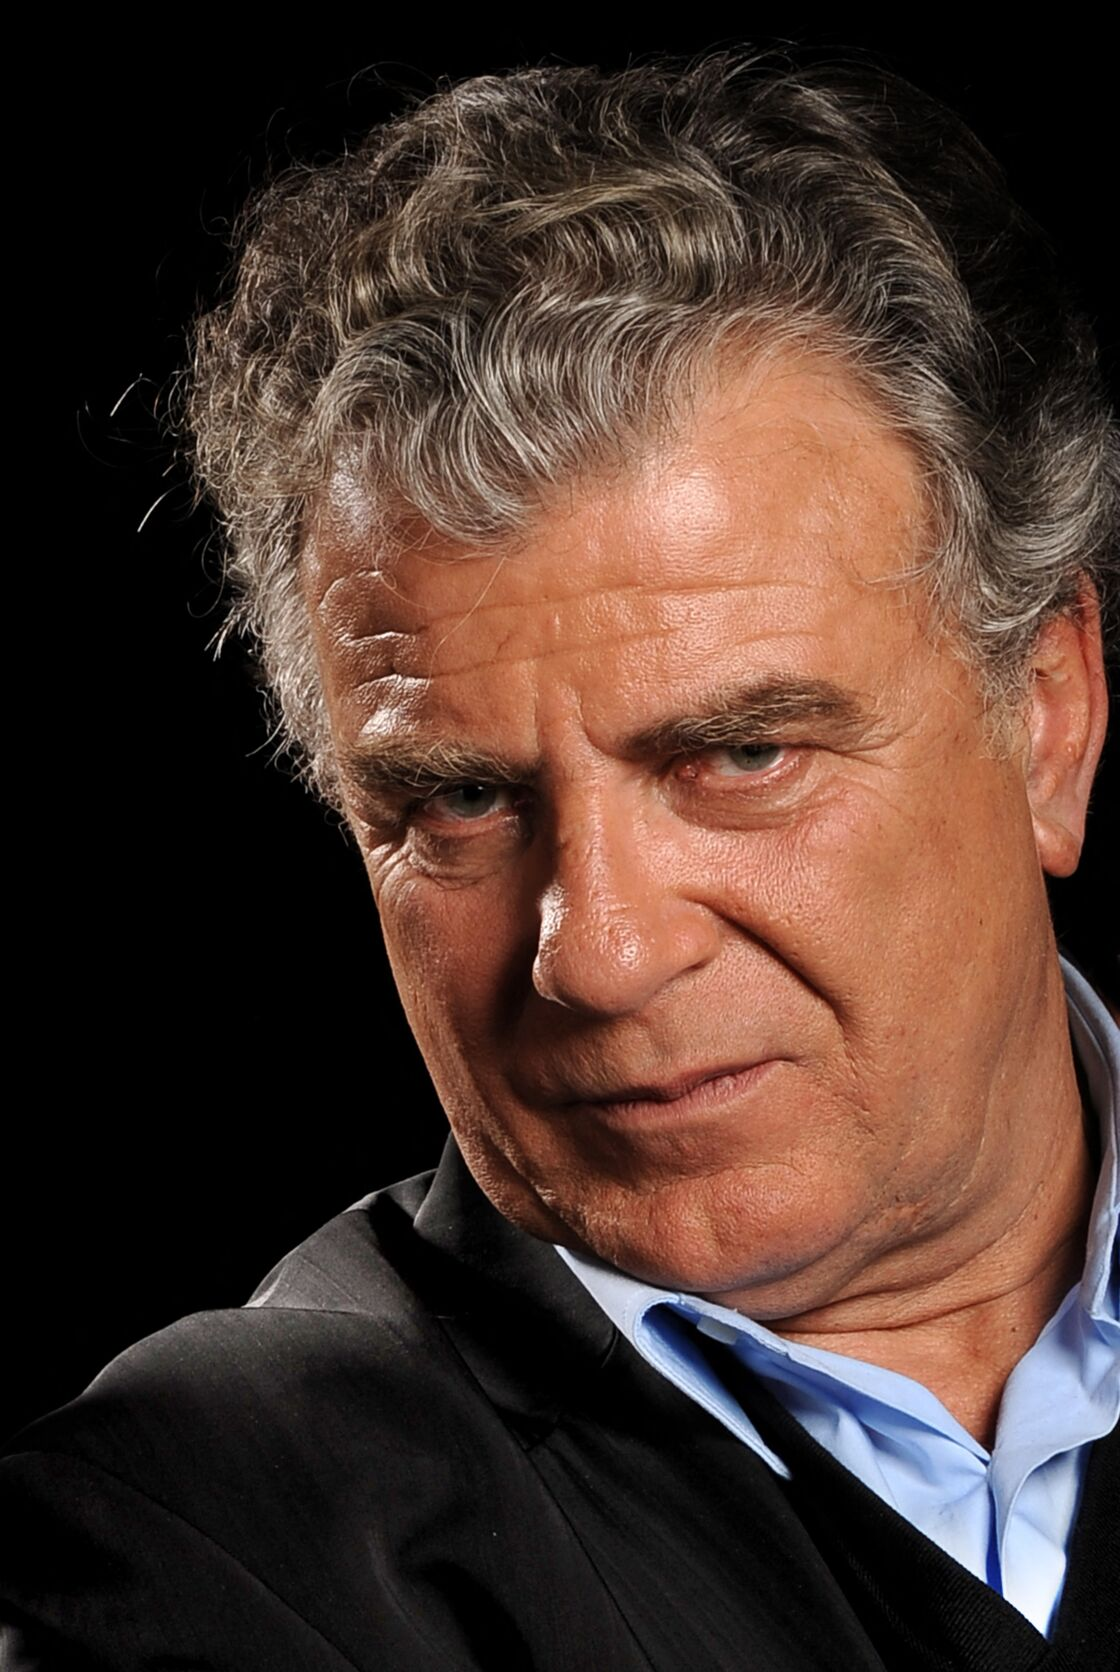 Olivier Duhamel accusé d'inceste